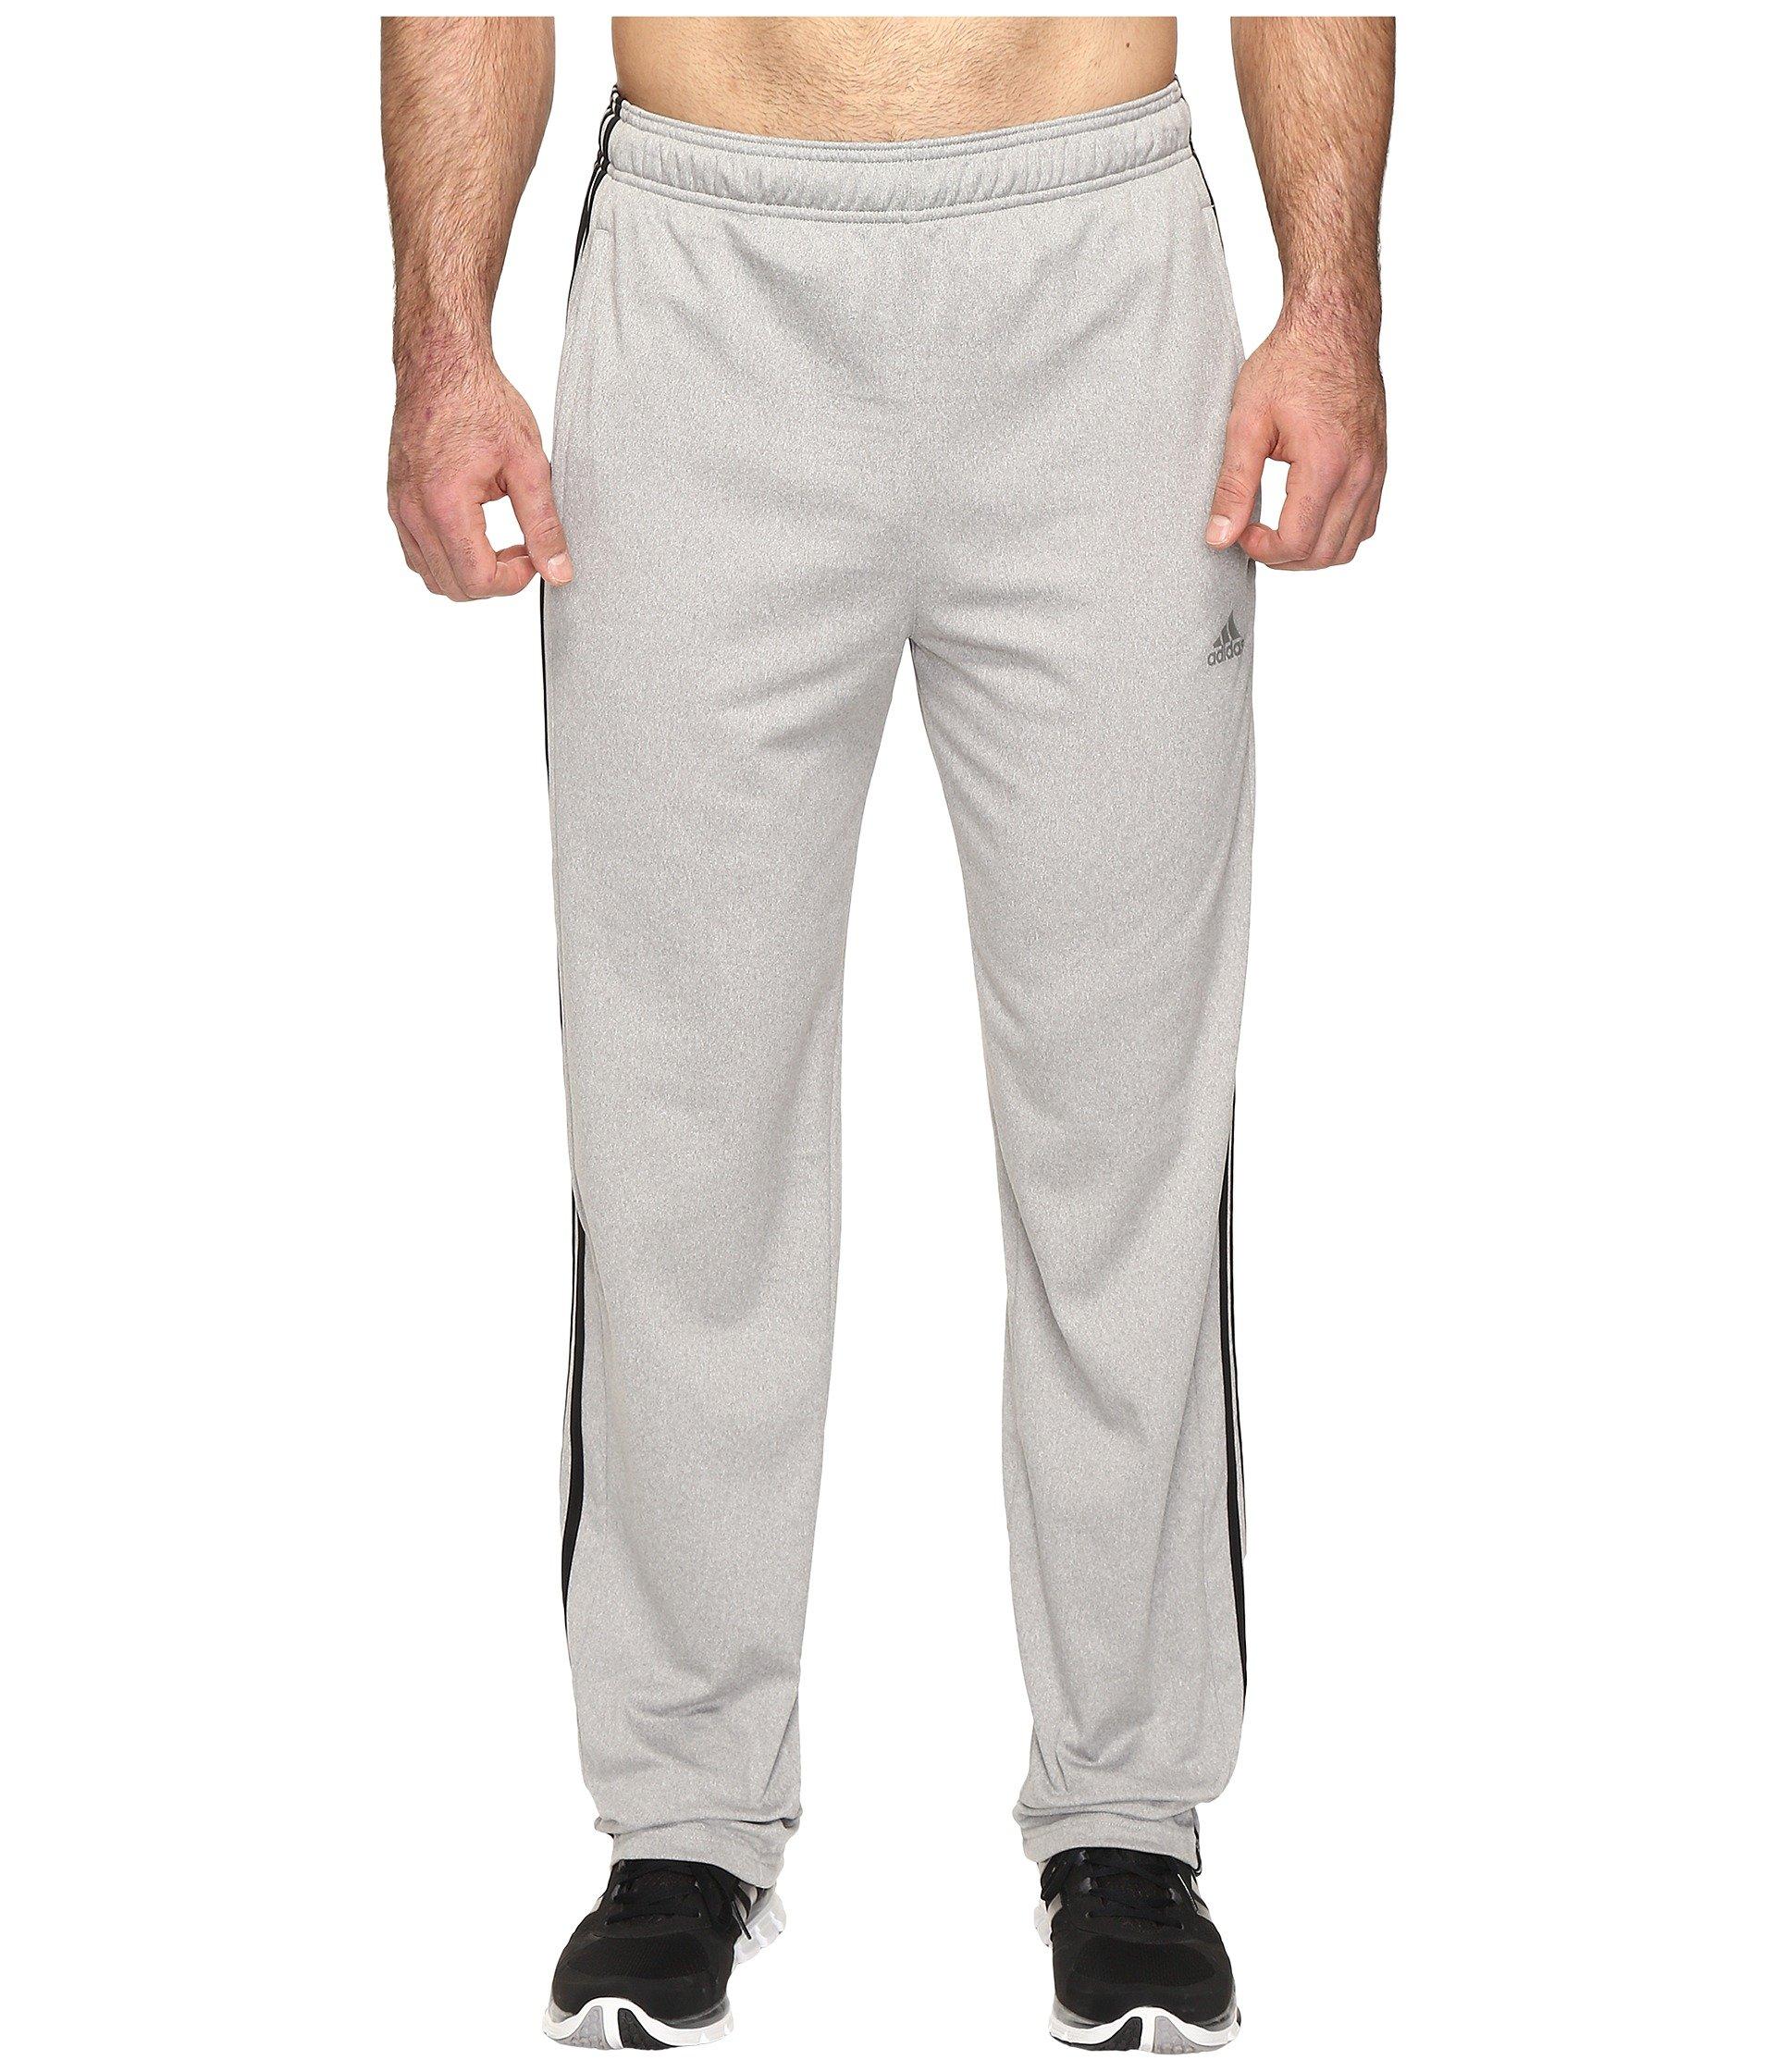 adidas Men's Essentials Track Pants (Extended Sizes), Medium Grey Heather/Black Heather, XXX-Large by adidas